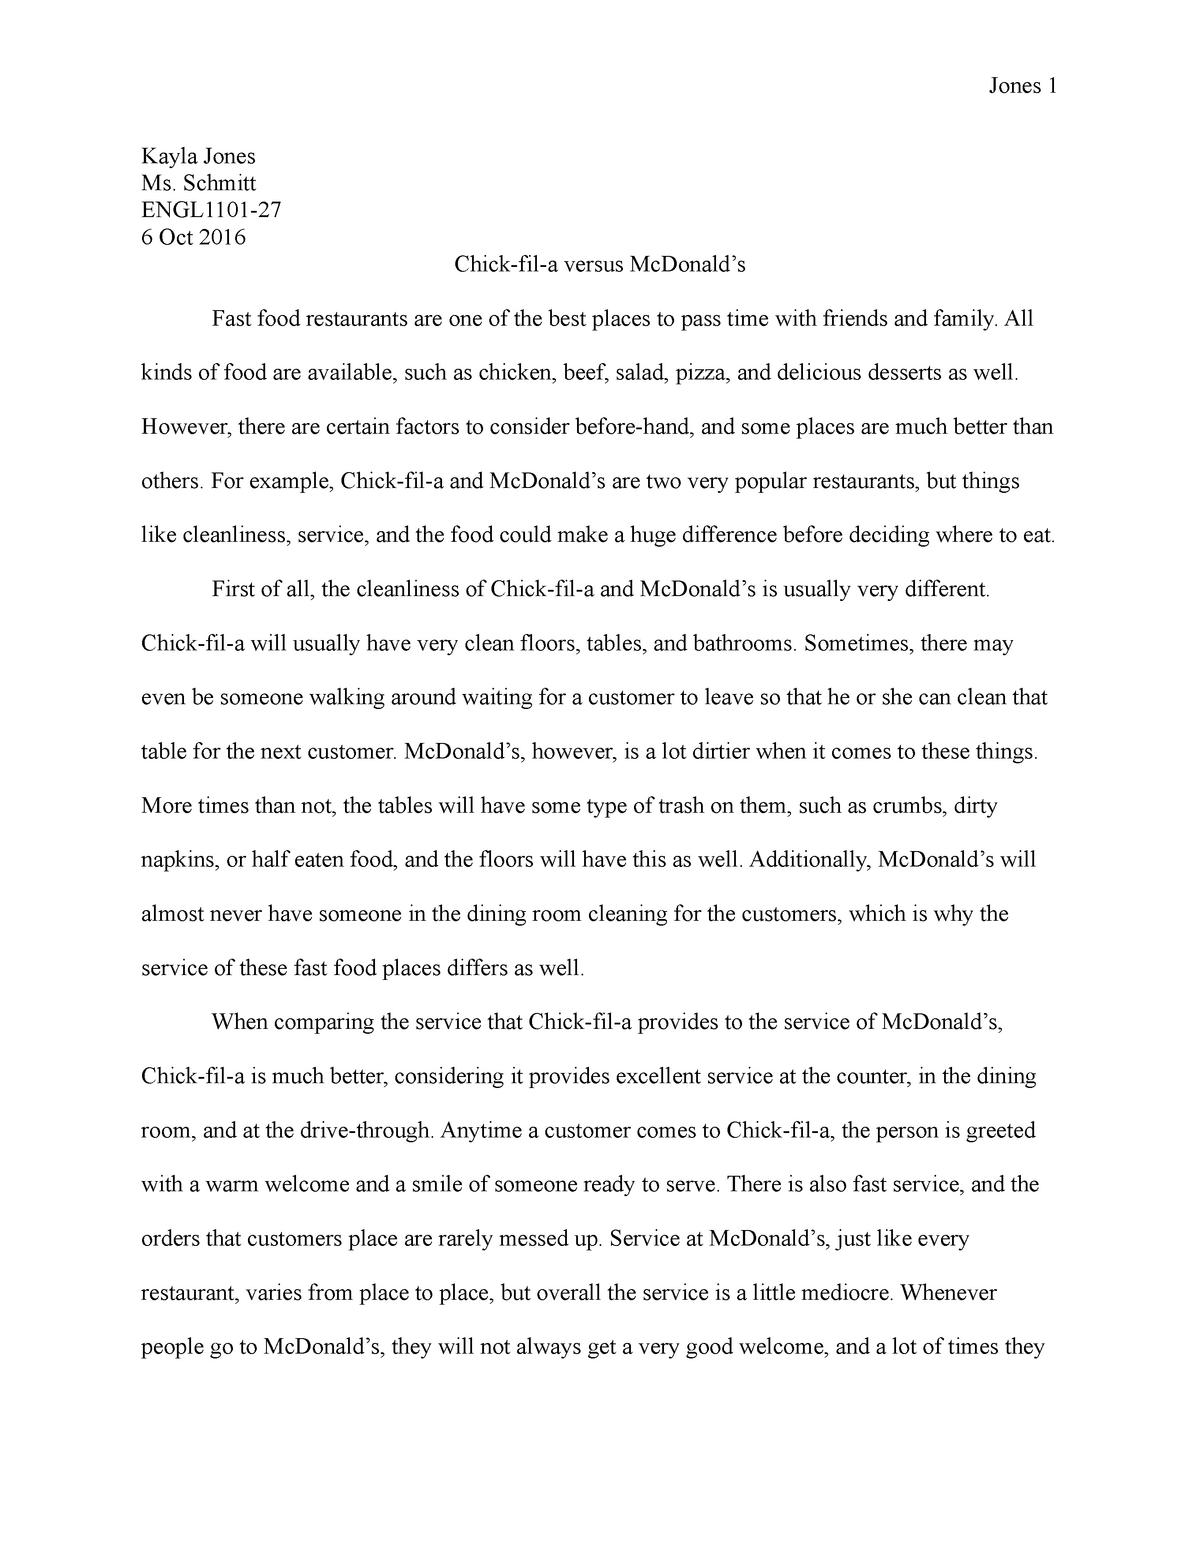 300 400 word essay